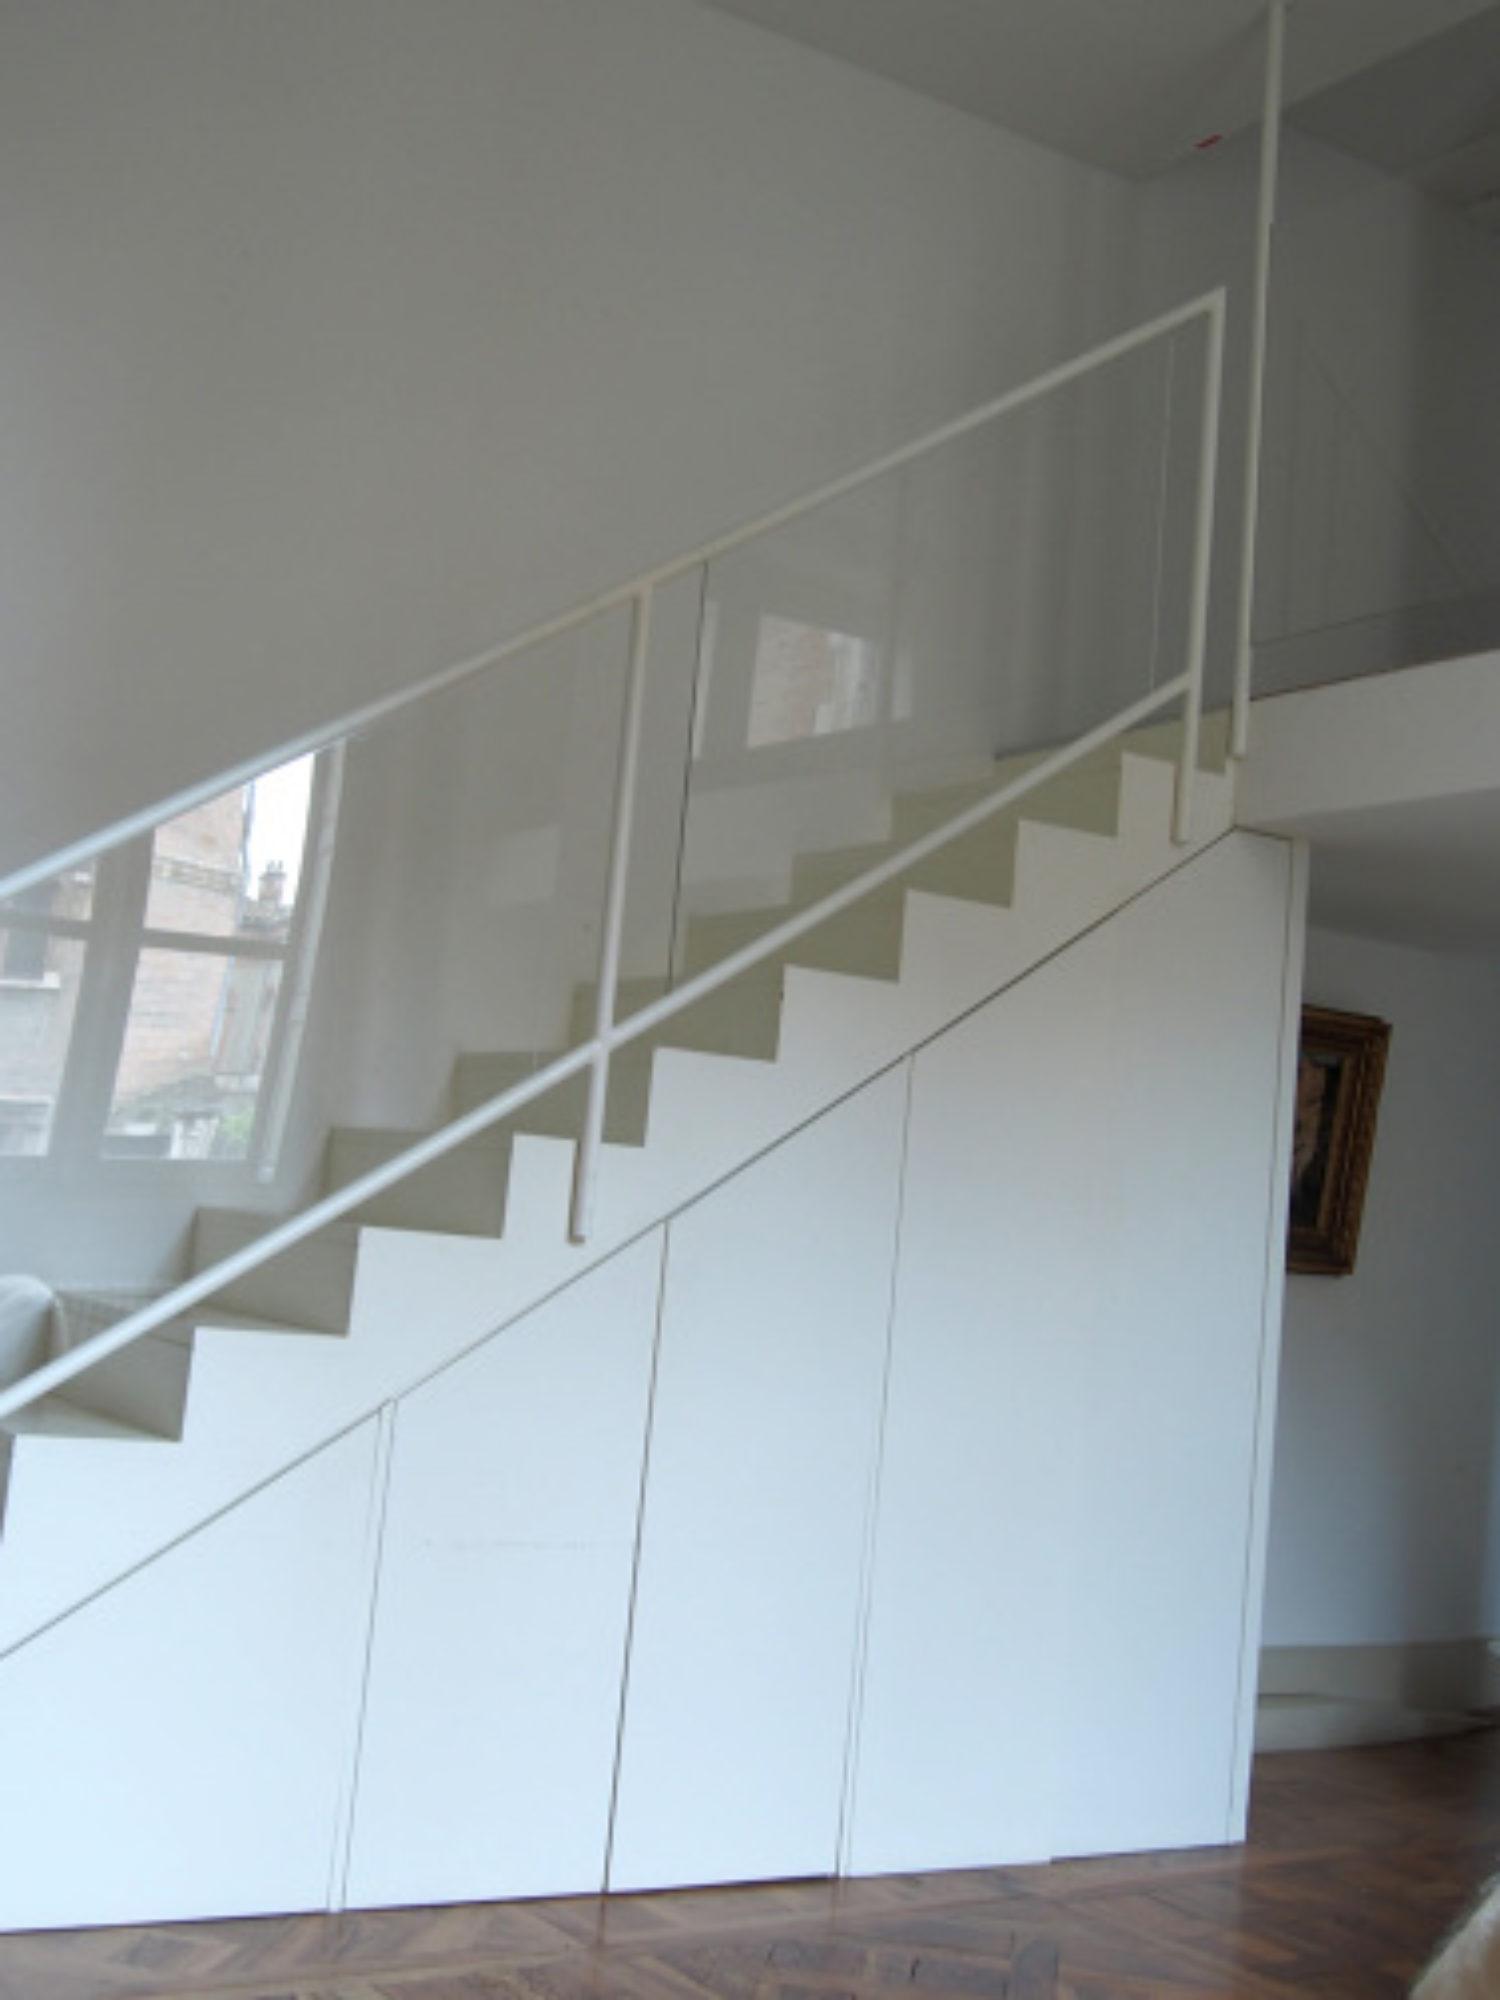 RAMBARDE & GARDE-CORPS • Comment sécuriser un escalier sculptural